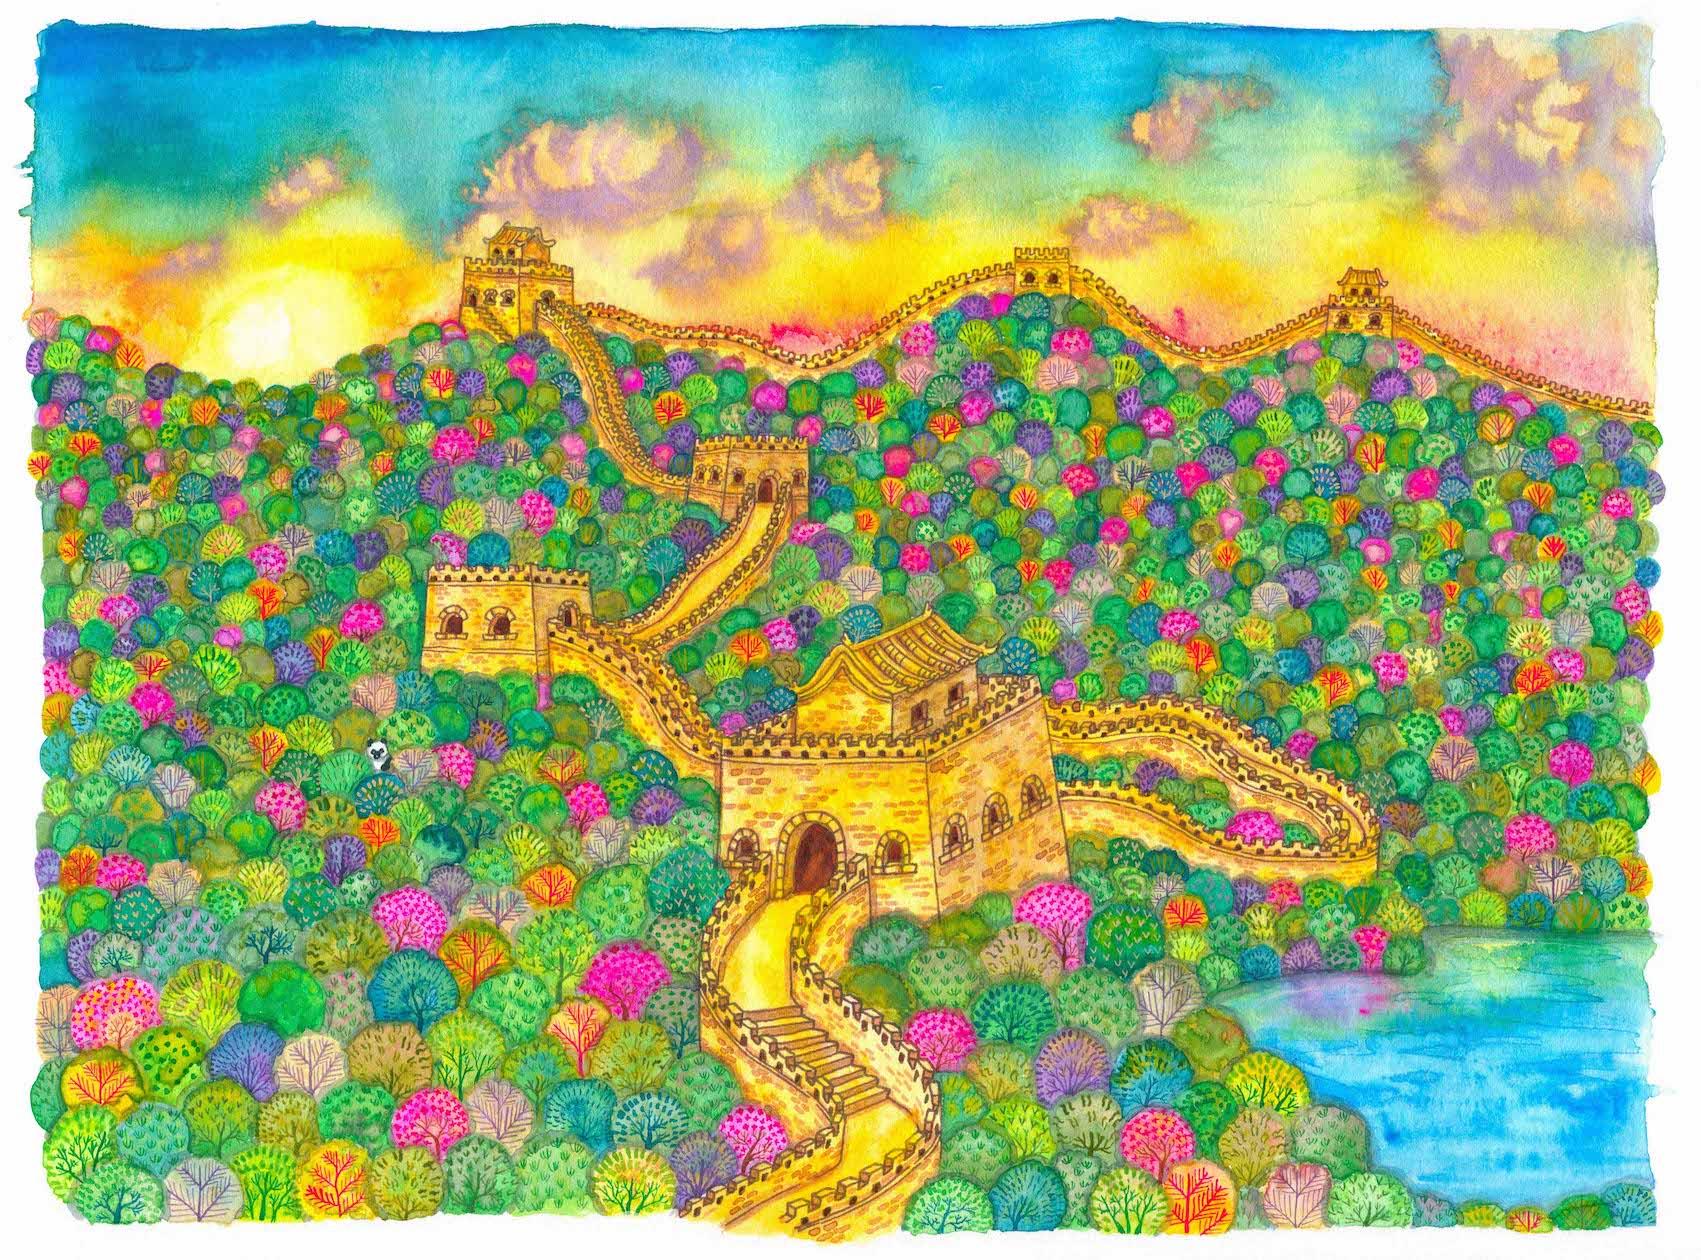 The Great Wall Liuba Draws